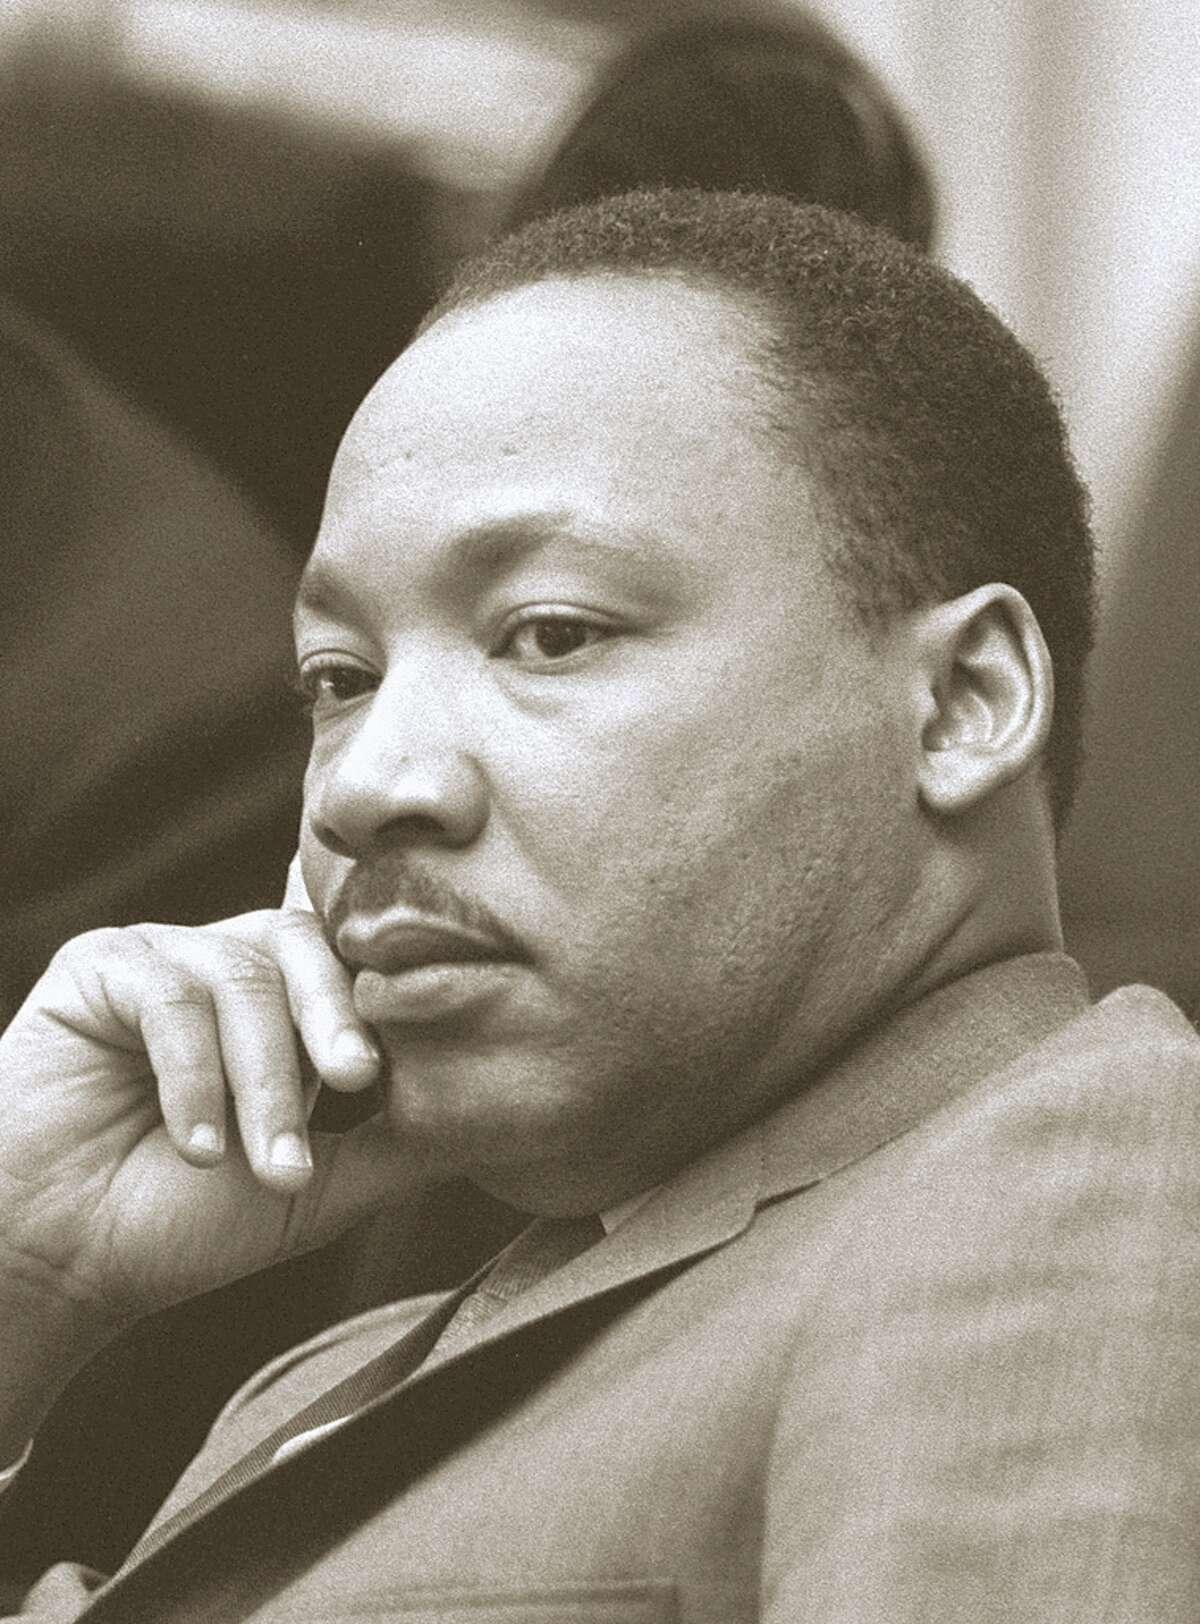 Location: Cabinet Room, White House, Washington, DC Description: L-R: President Lyndon B. Johnson, Rev. Dr. Martin Luther King, Jr.